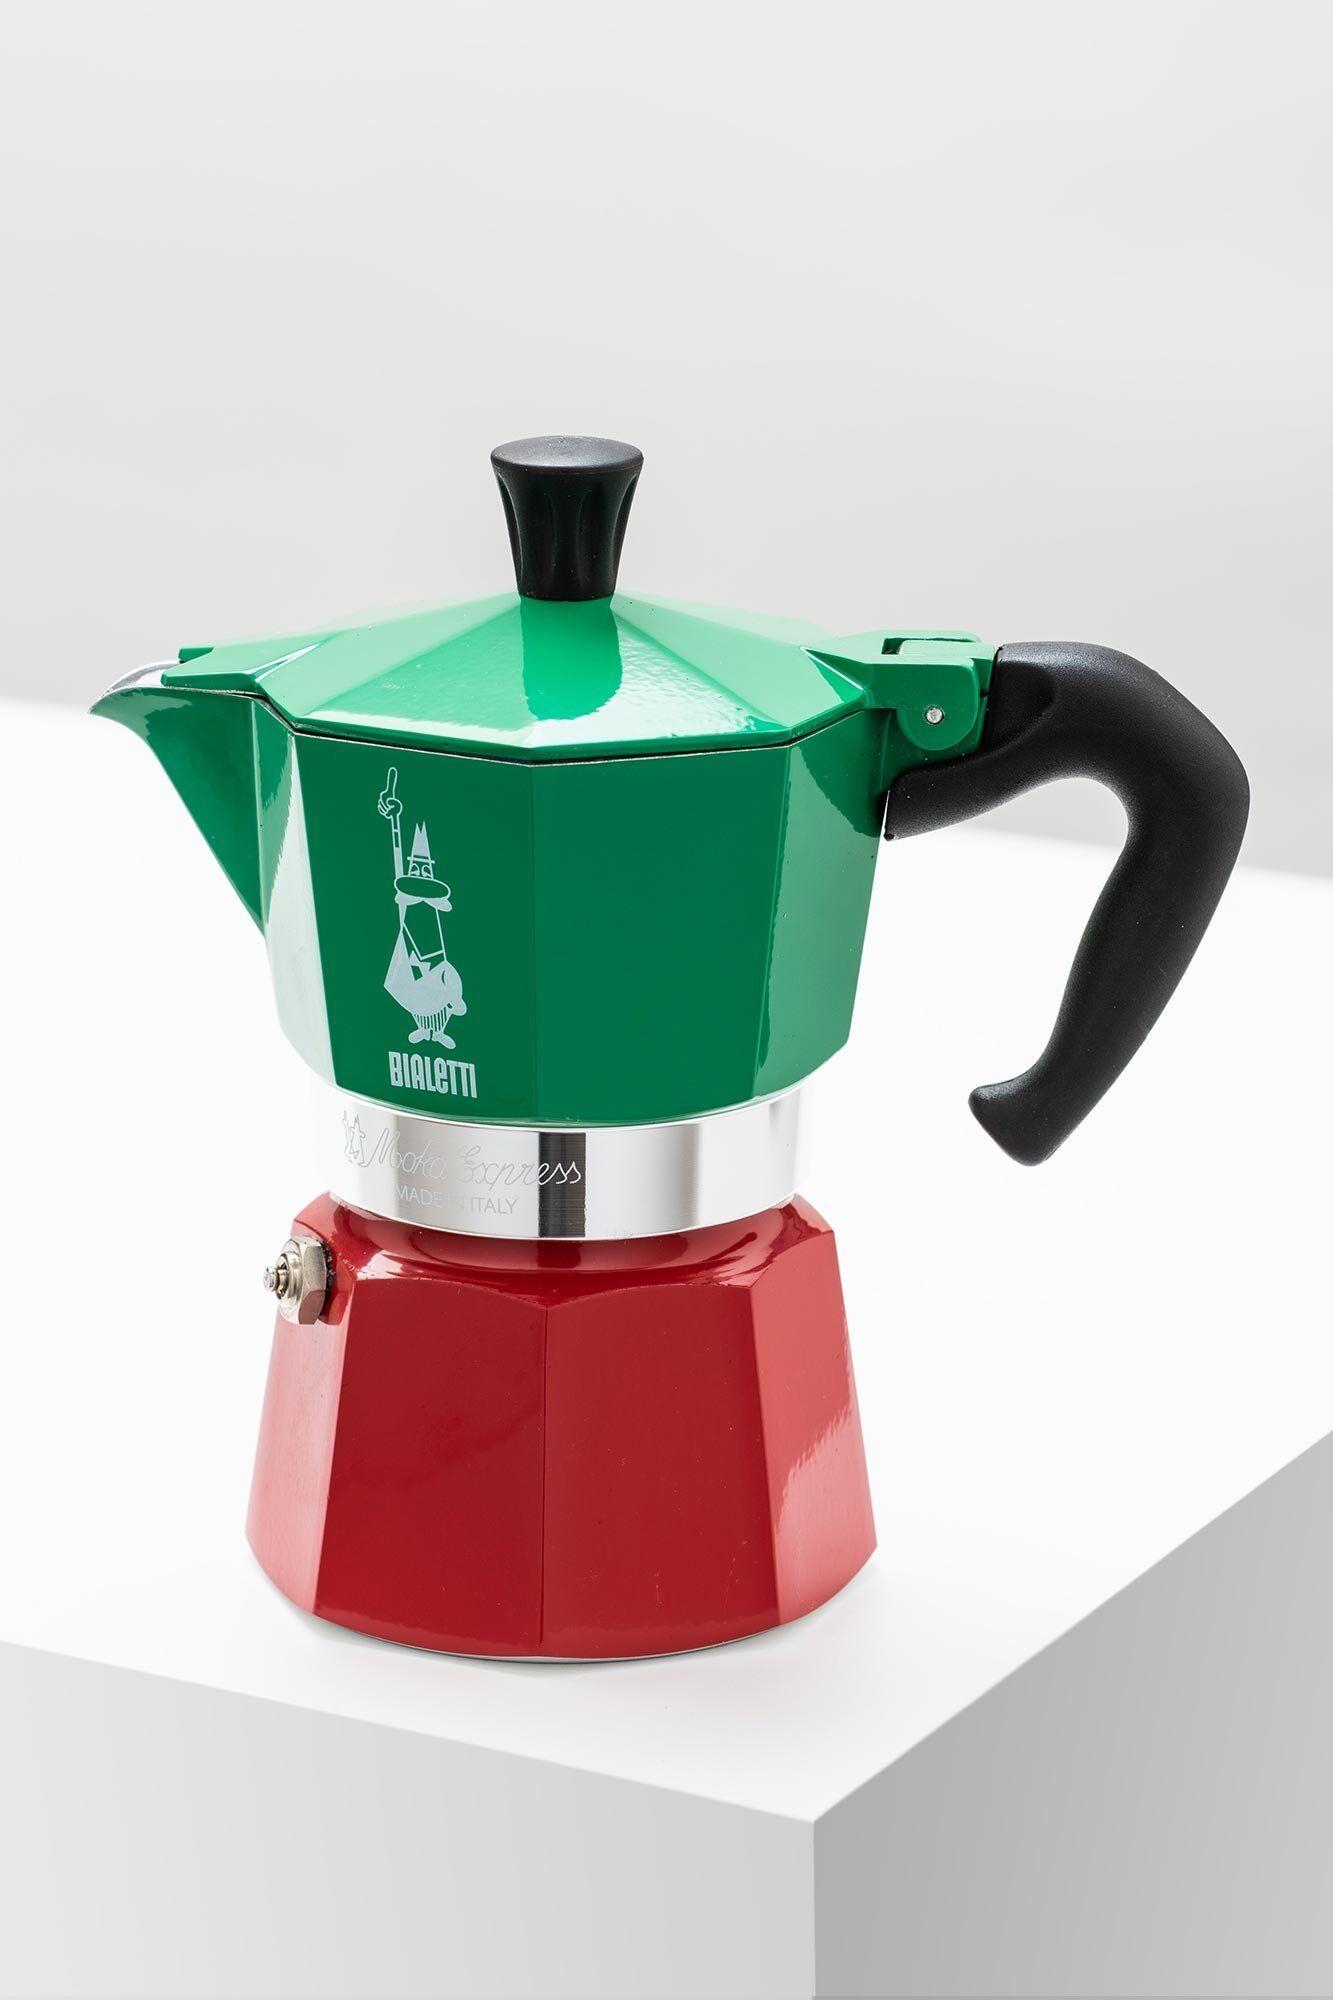 Bialetti Espressokocher Moka Express Tricolore 3 Tassen